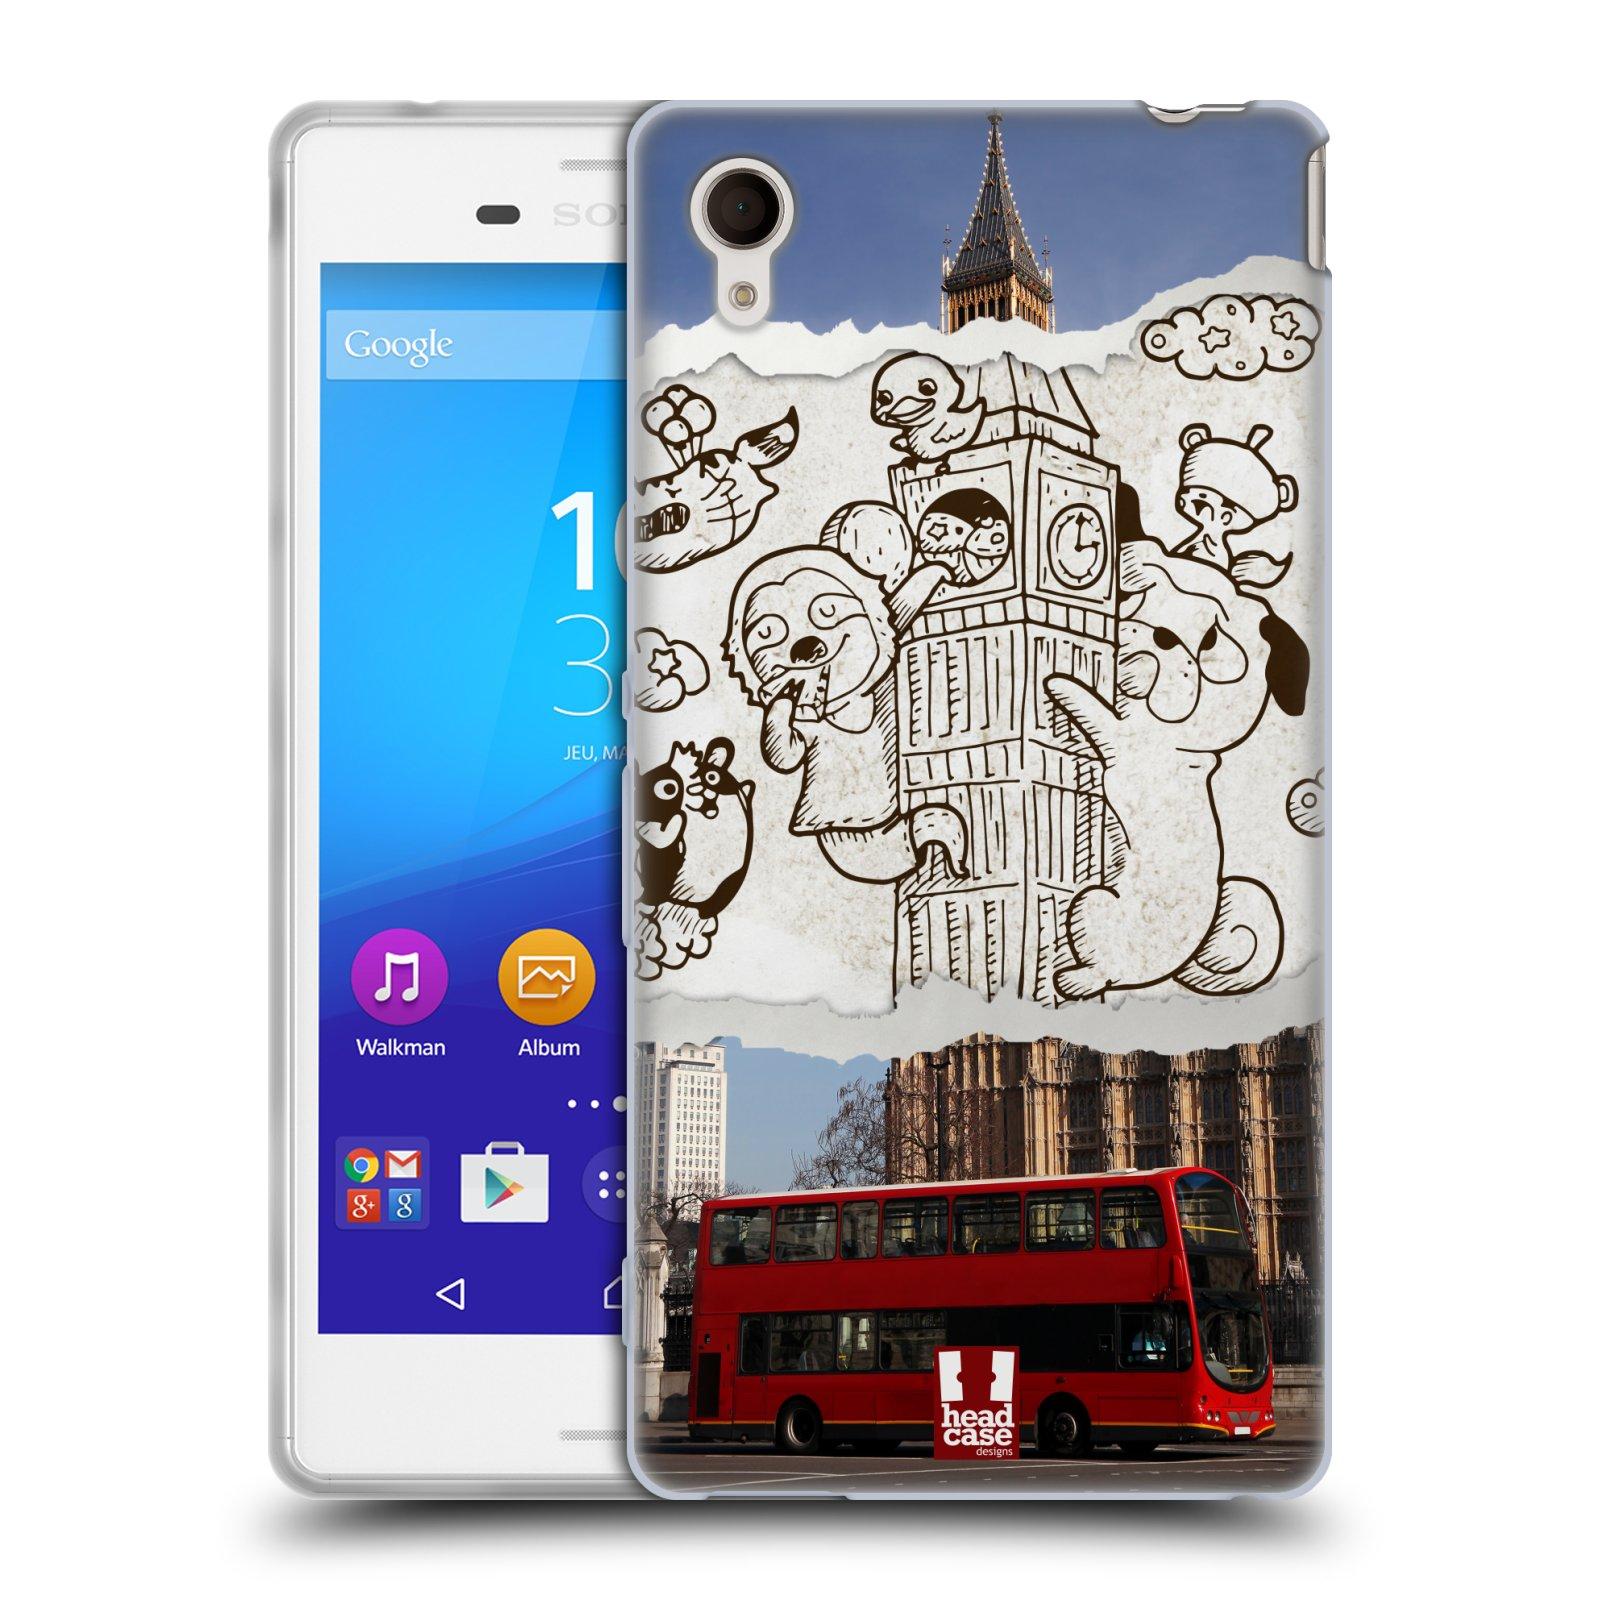 Silikonové pouzdro na mobil Sony Xperia M4 Aqua E2303 HEAD CASE DOODLE TRIP LONDÝN (Silikonový kryt či obal na mobilní telefon Sony Xperia M4 Aqua a M4 Aqua Dual SIM)